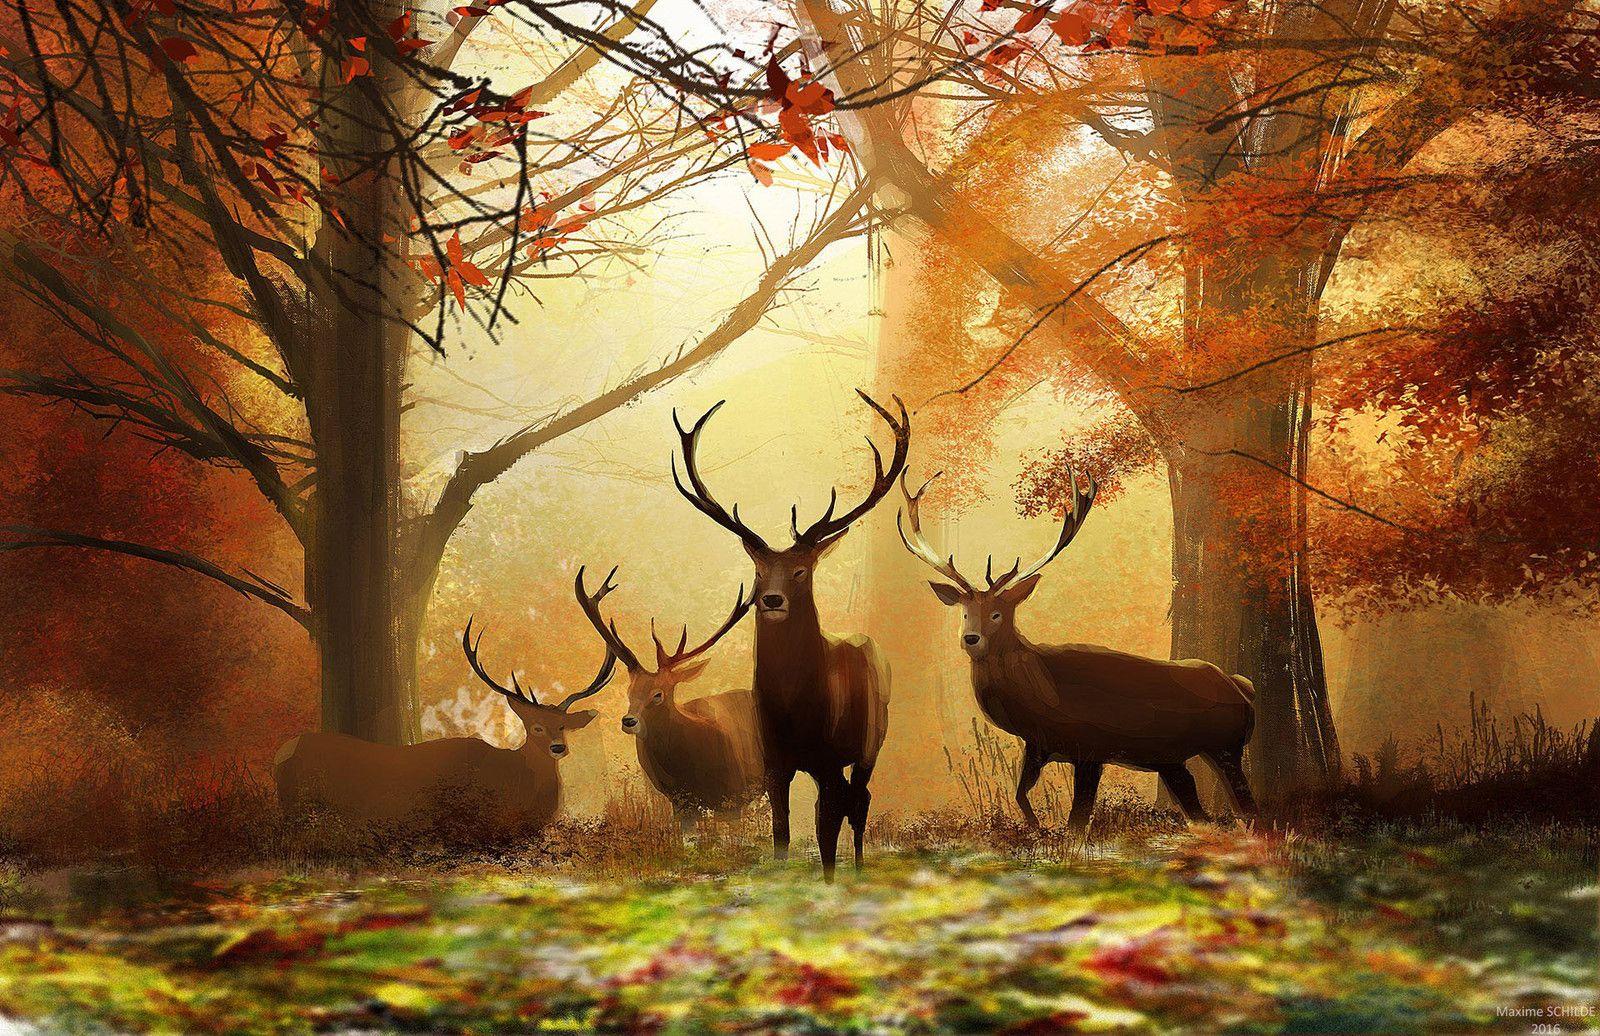 Forest, Maxime Schilde on ArtStation at https://www.artstation.com/artwork/WY3Vy